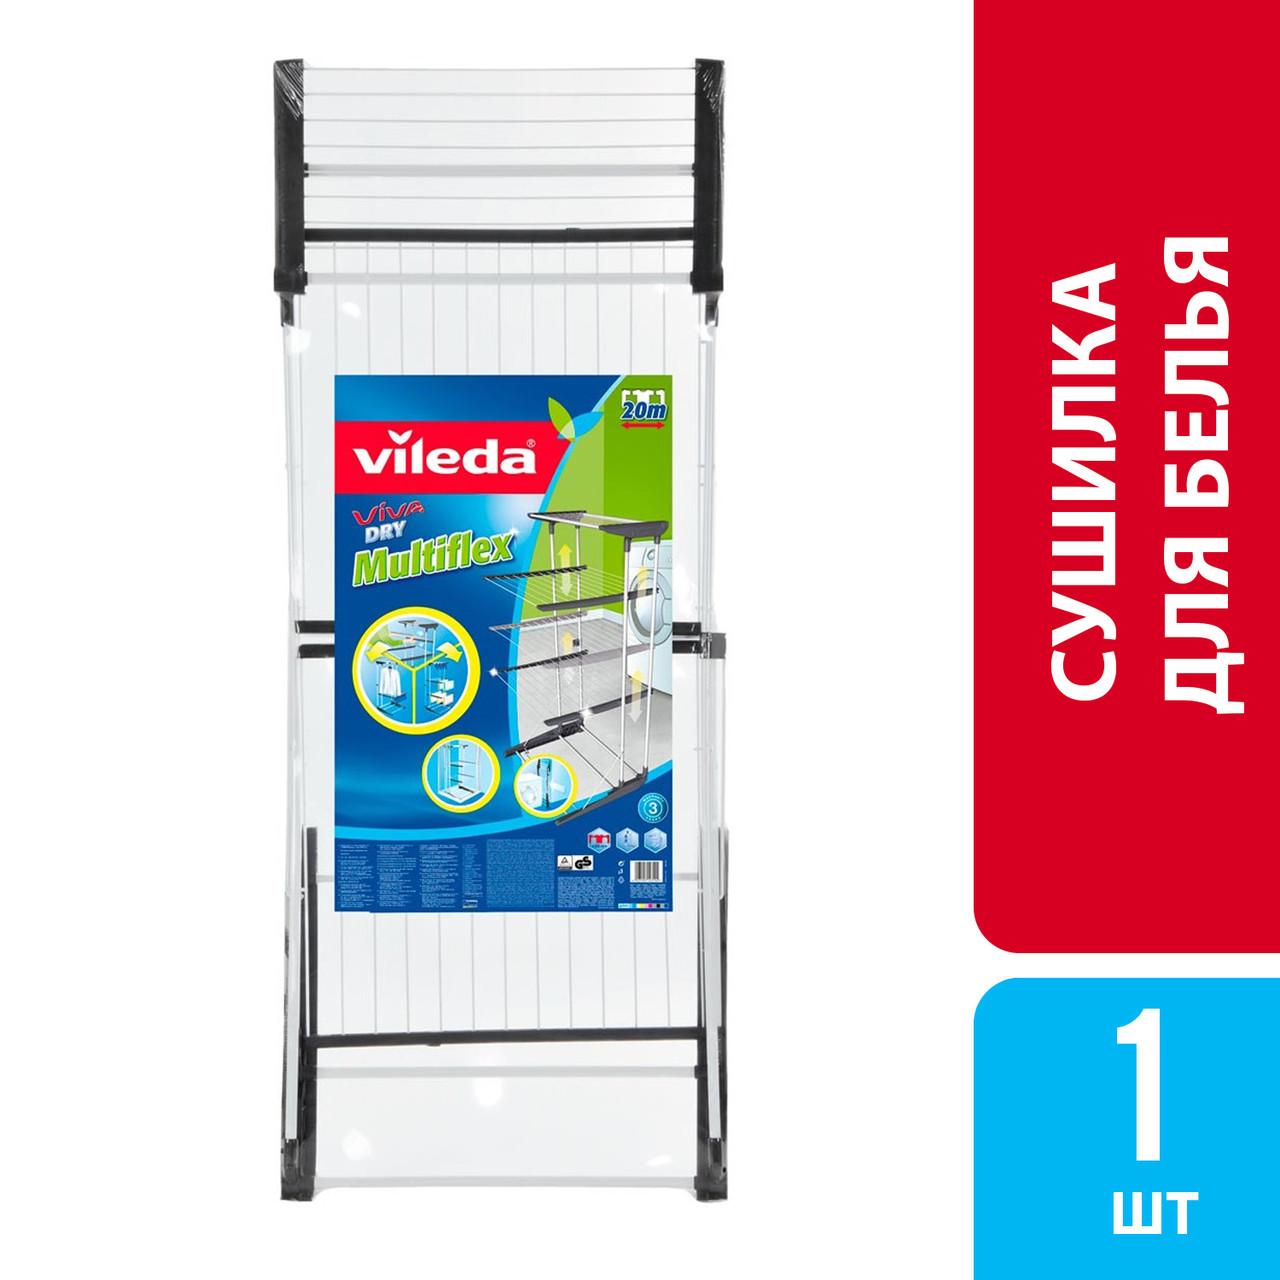 Сушарка для белья компактная Viva Dry Multiflex, Vileda, 1 шт.